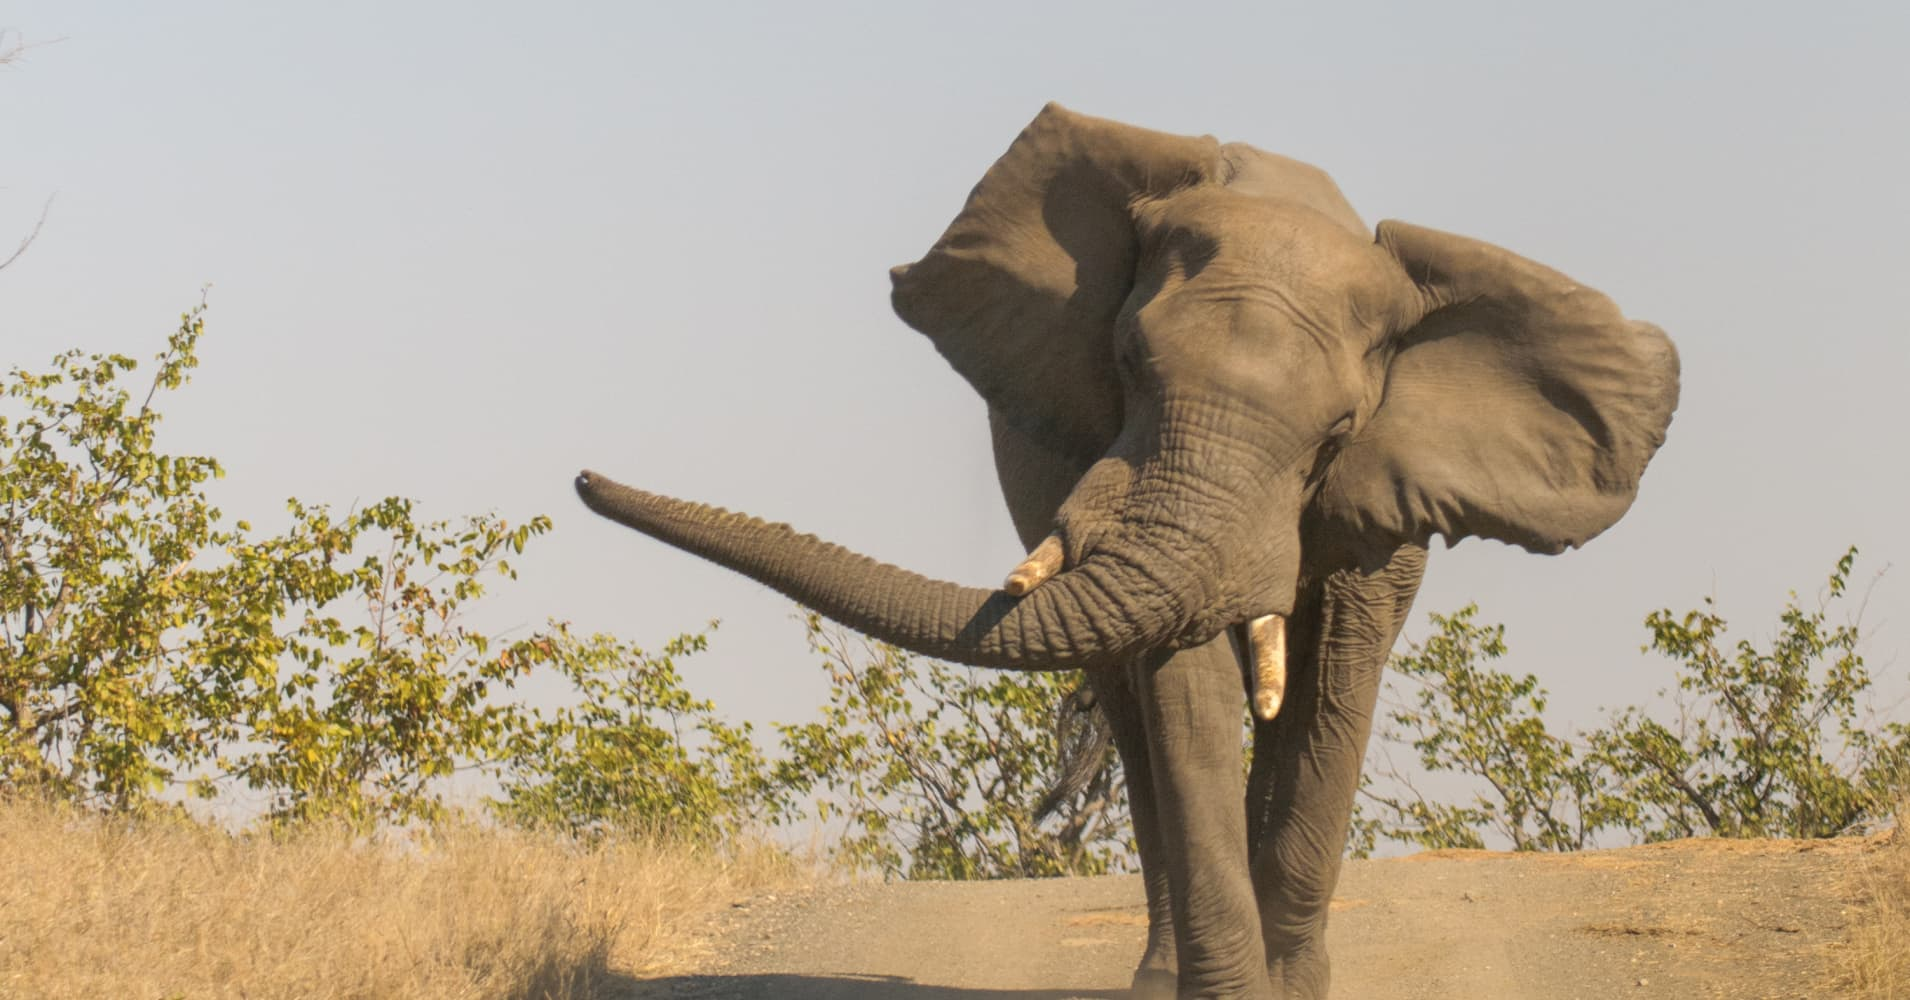 Cramer Horses And Elephants Plundering Stocks